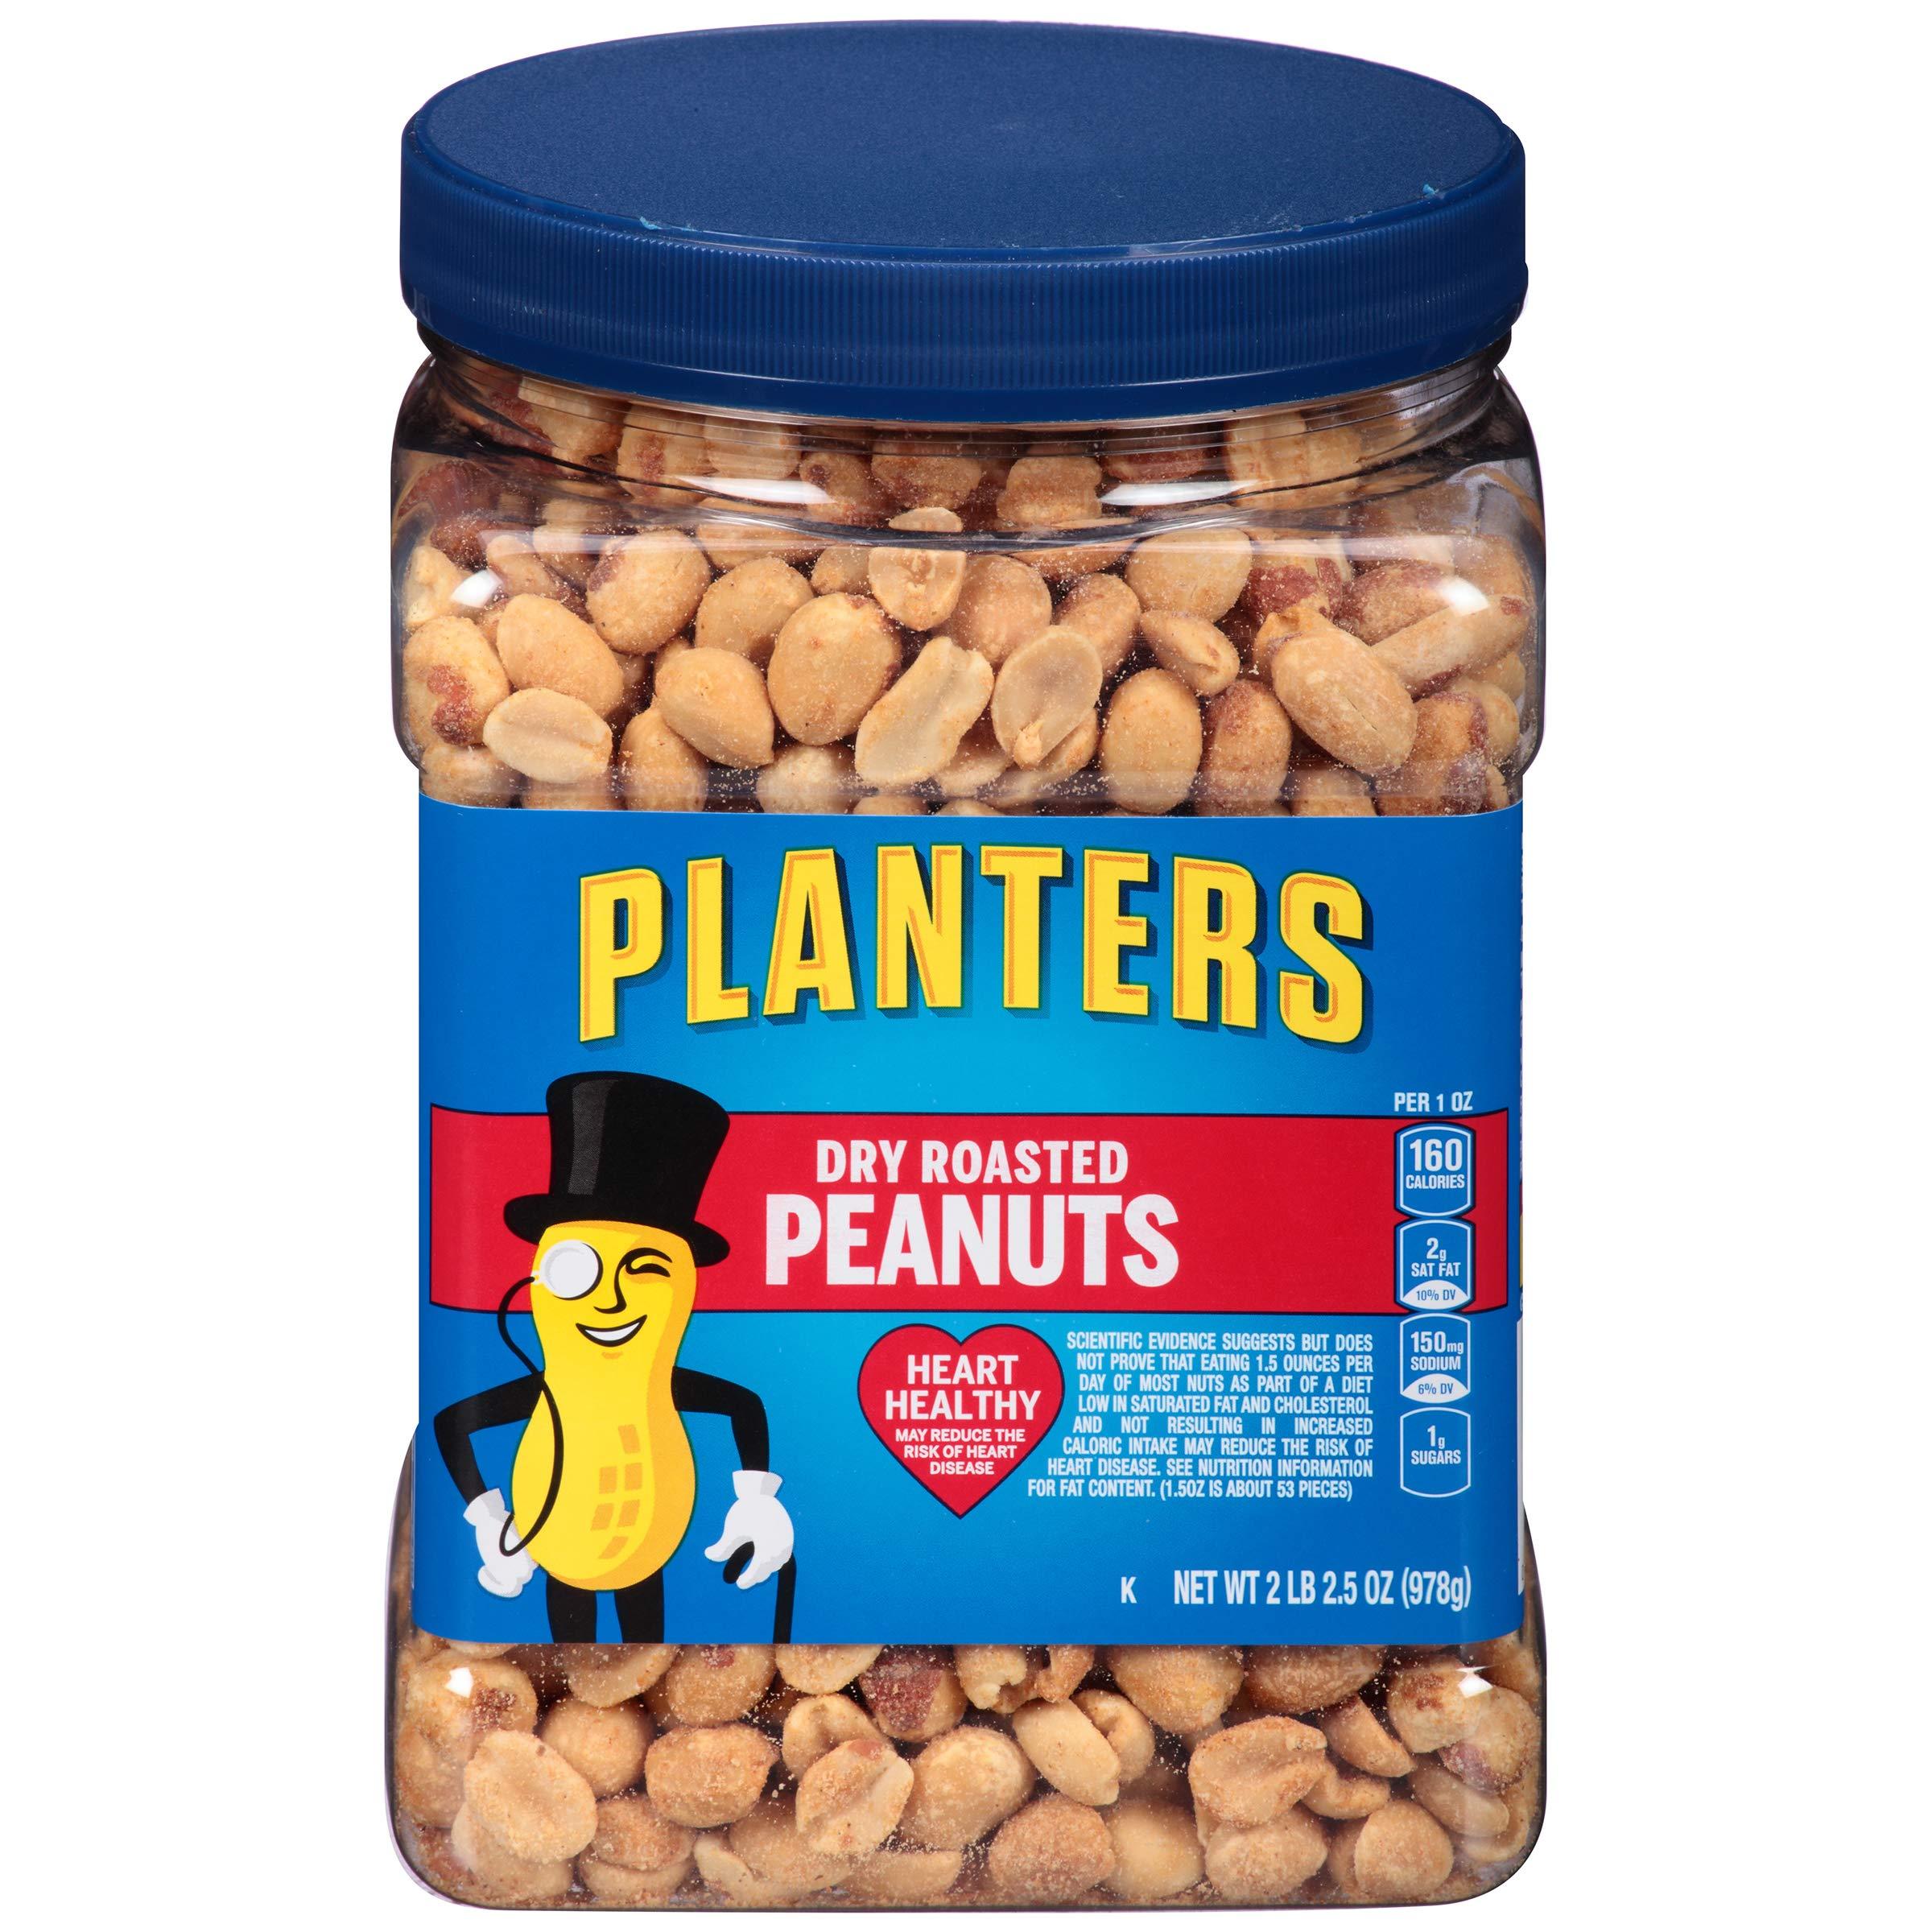 Planters Peanuts, Dry Roasted & Salted, 34.5 Ounce Jar